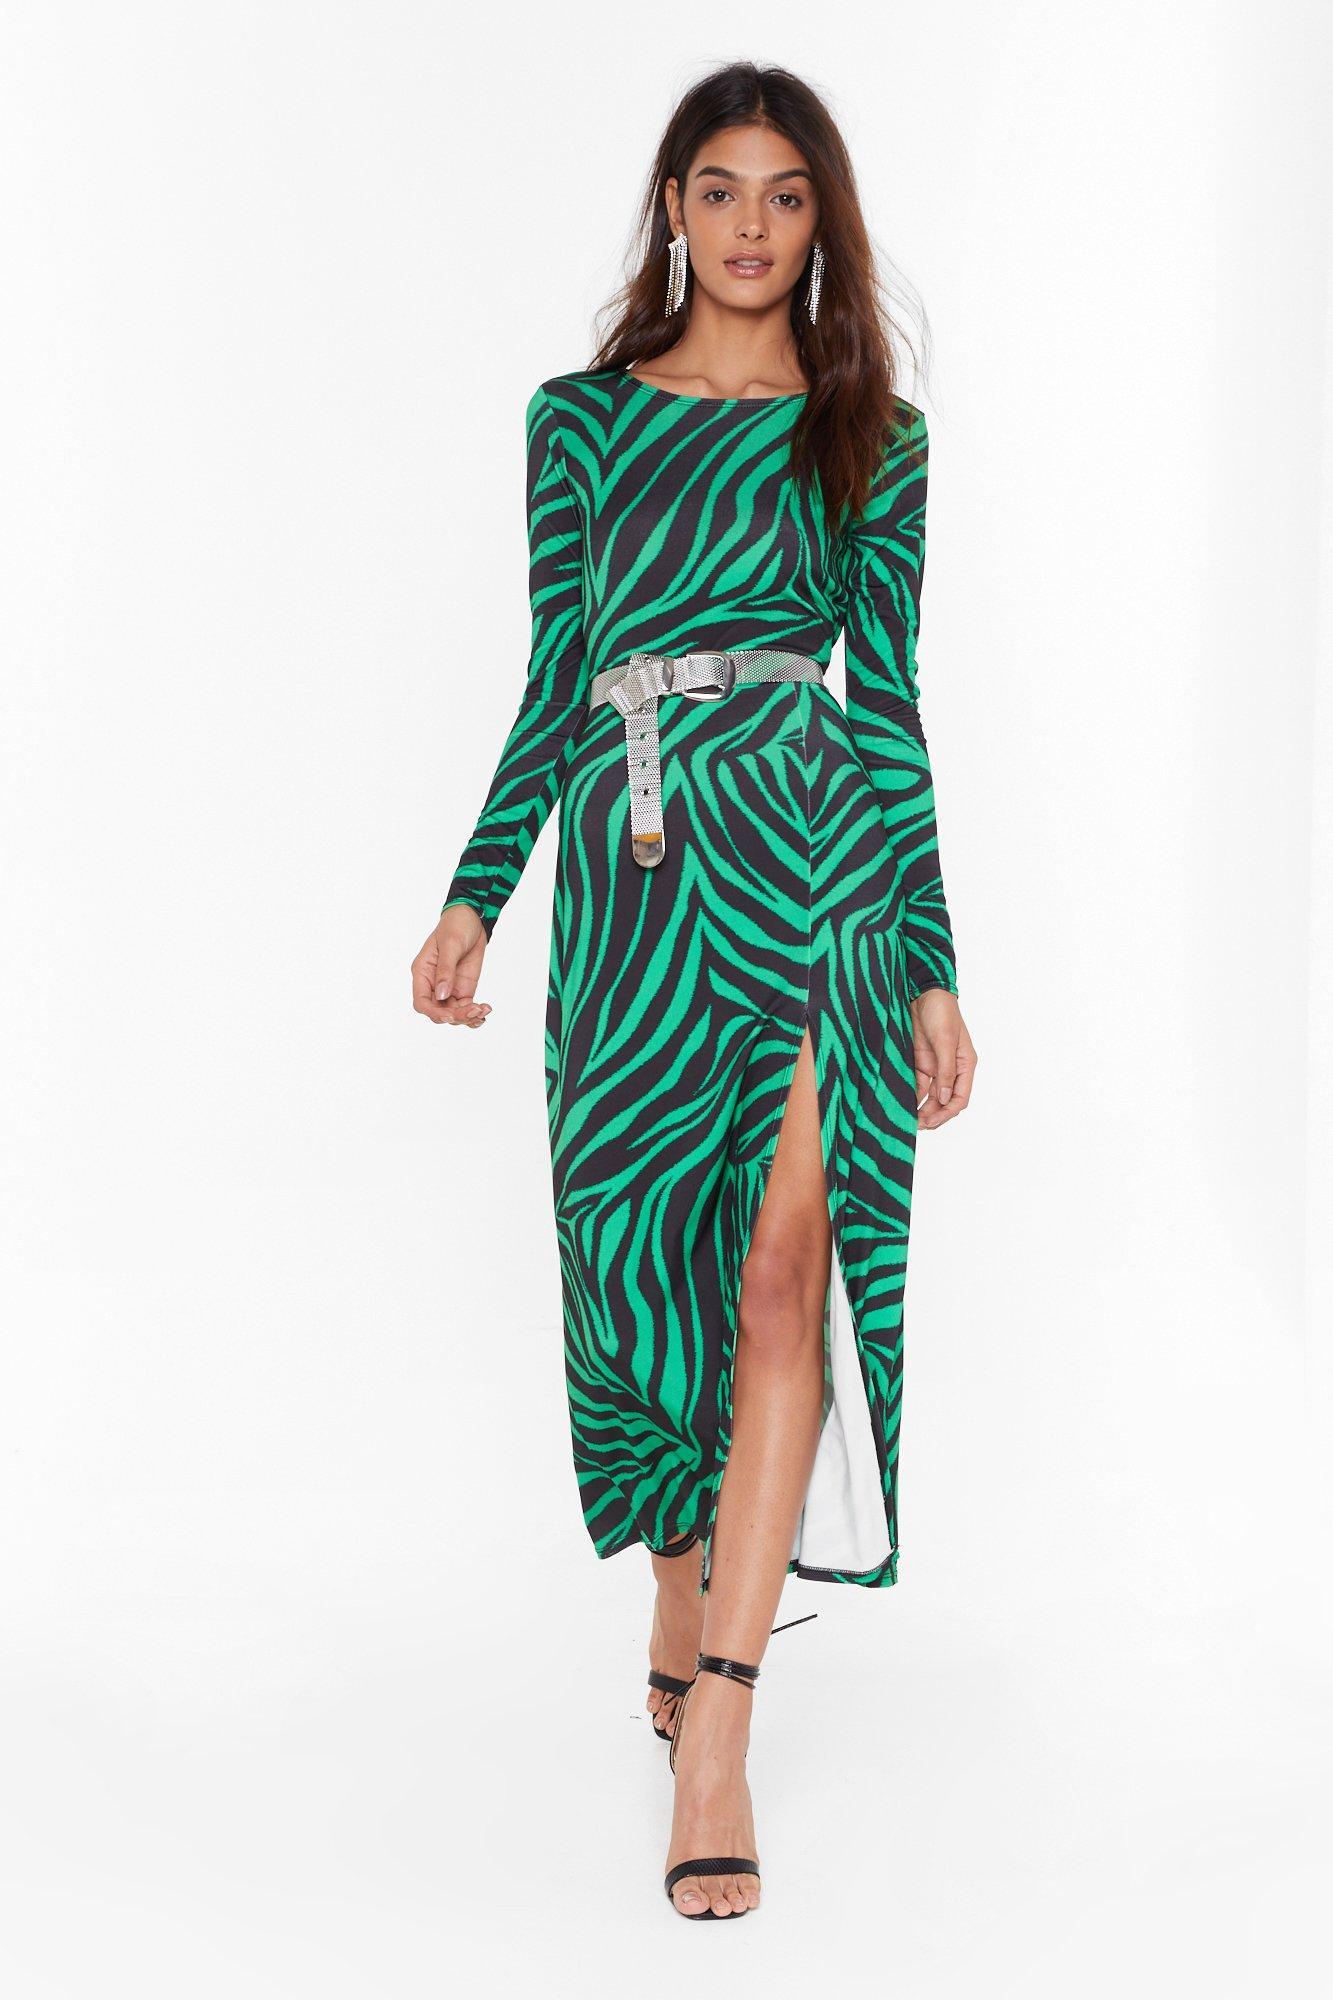 Image of Cowl of the Wild Zebra Midi Dress